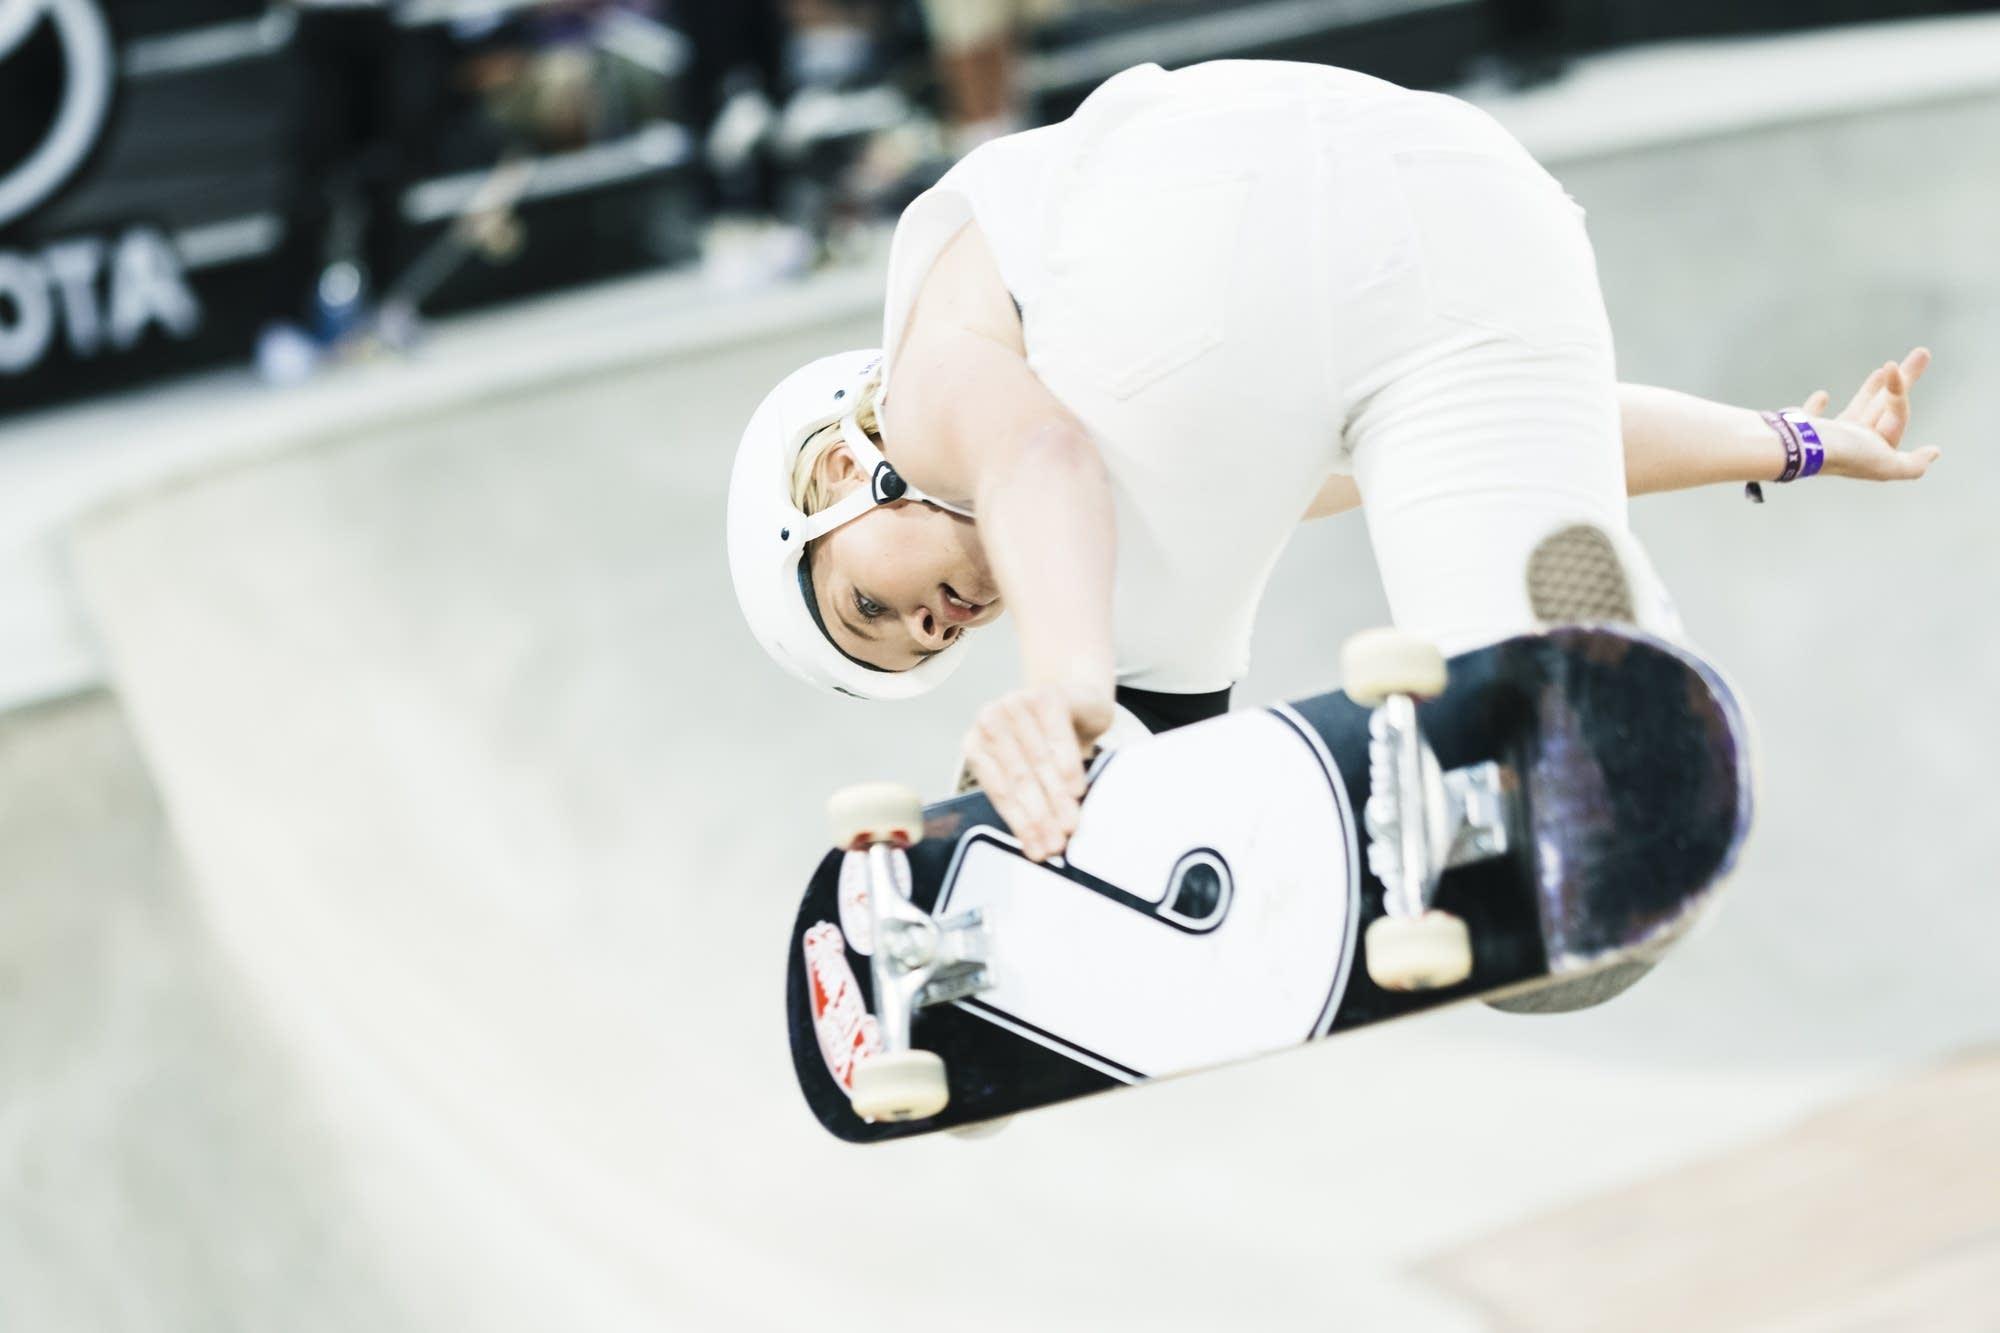 Australian Poppy Olsen grabs her board in the air.